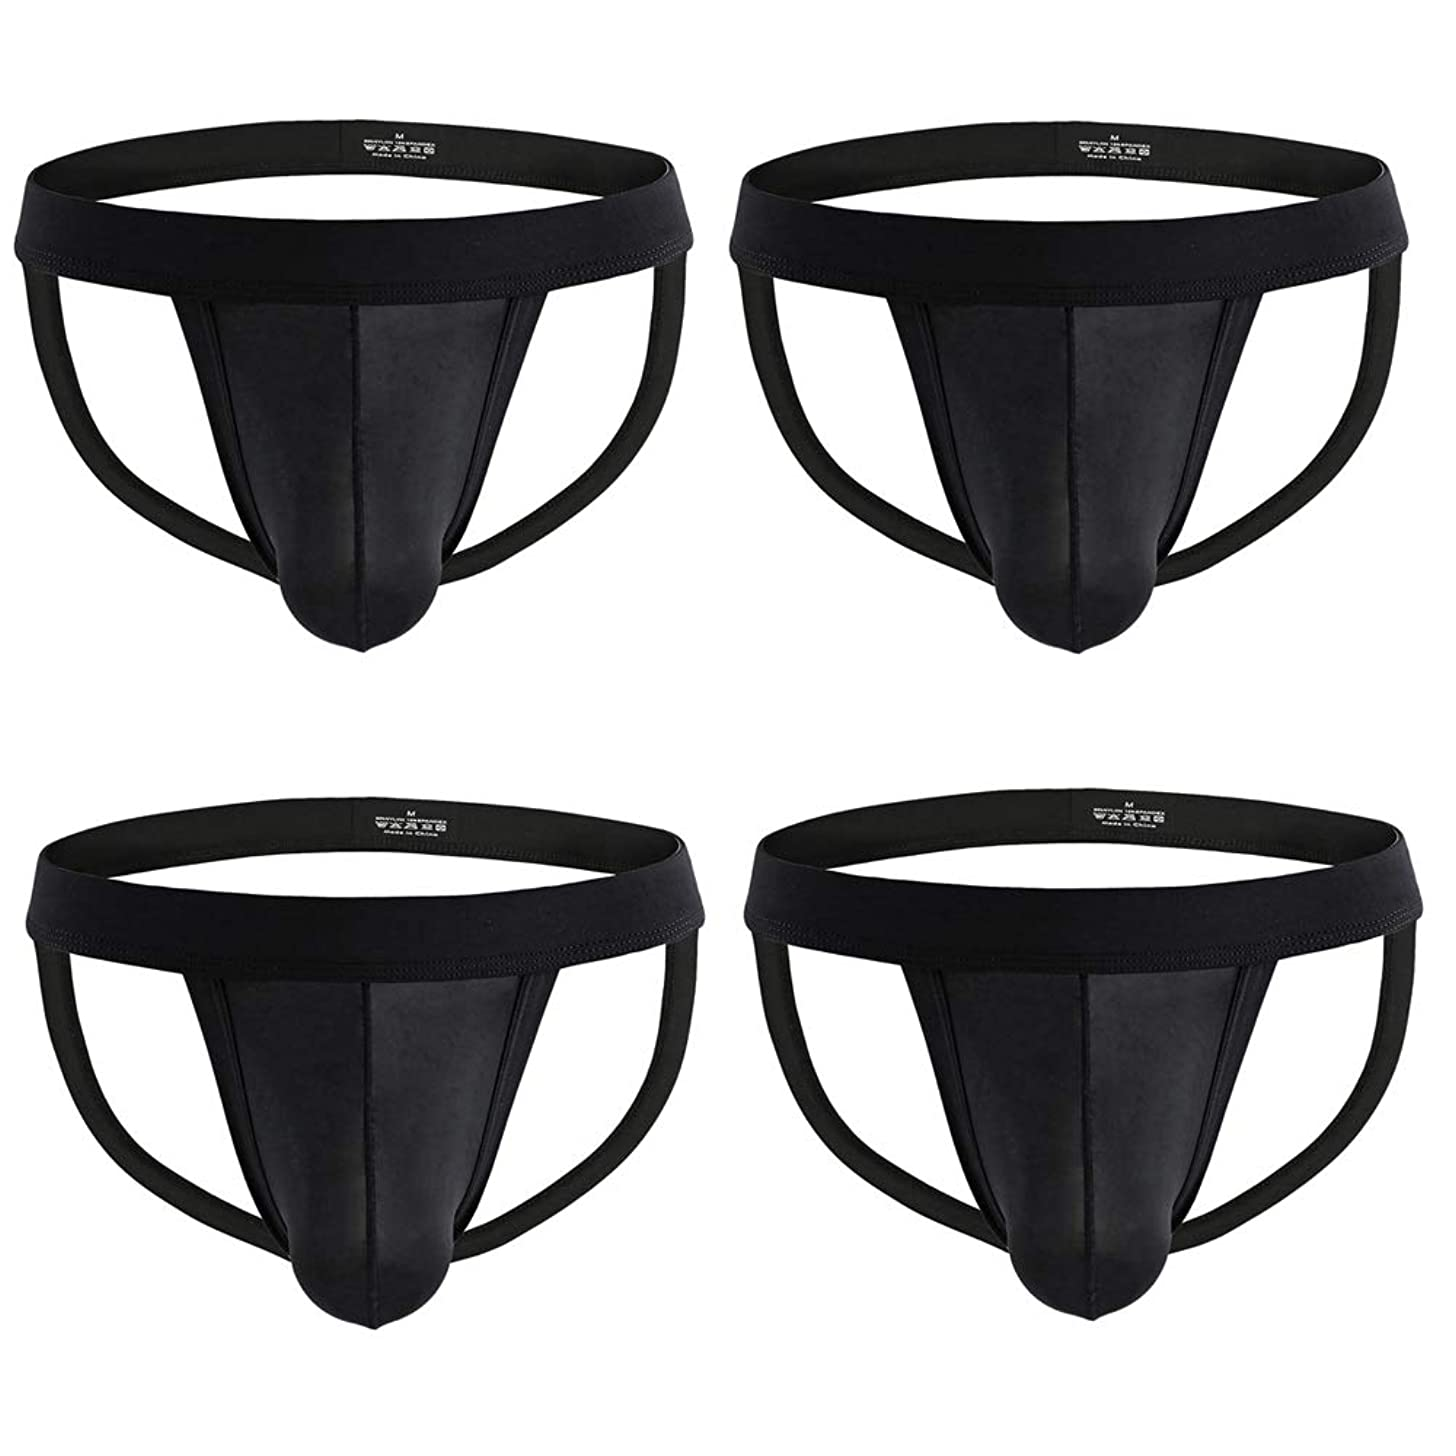 Nightaste Men Jockstrap Underwear Athletic Supporter Performance Breathable G-String Thong Undies